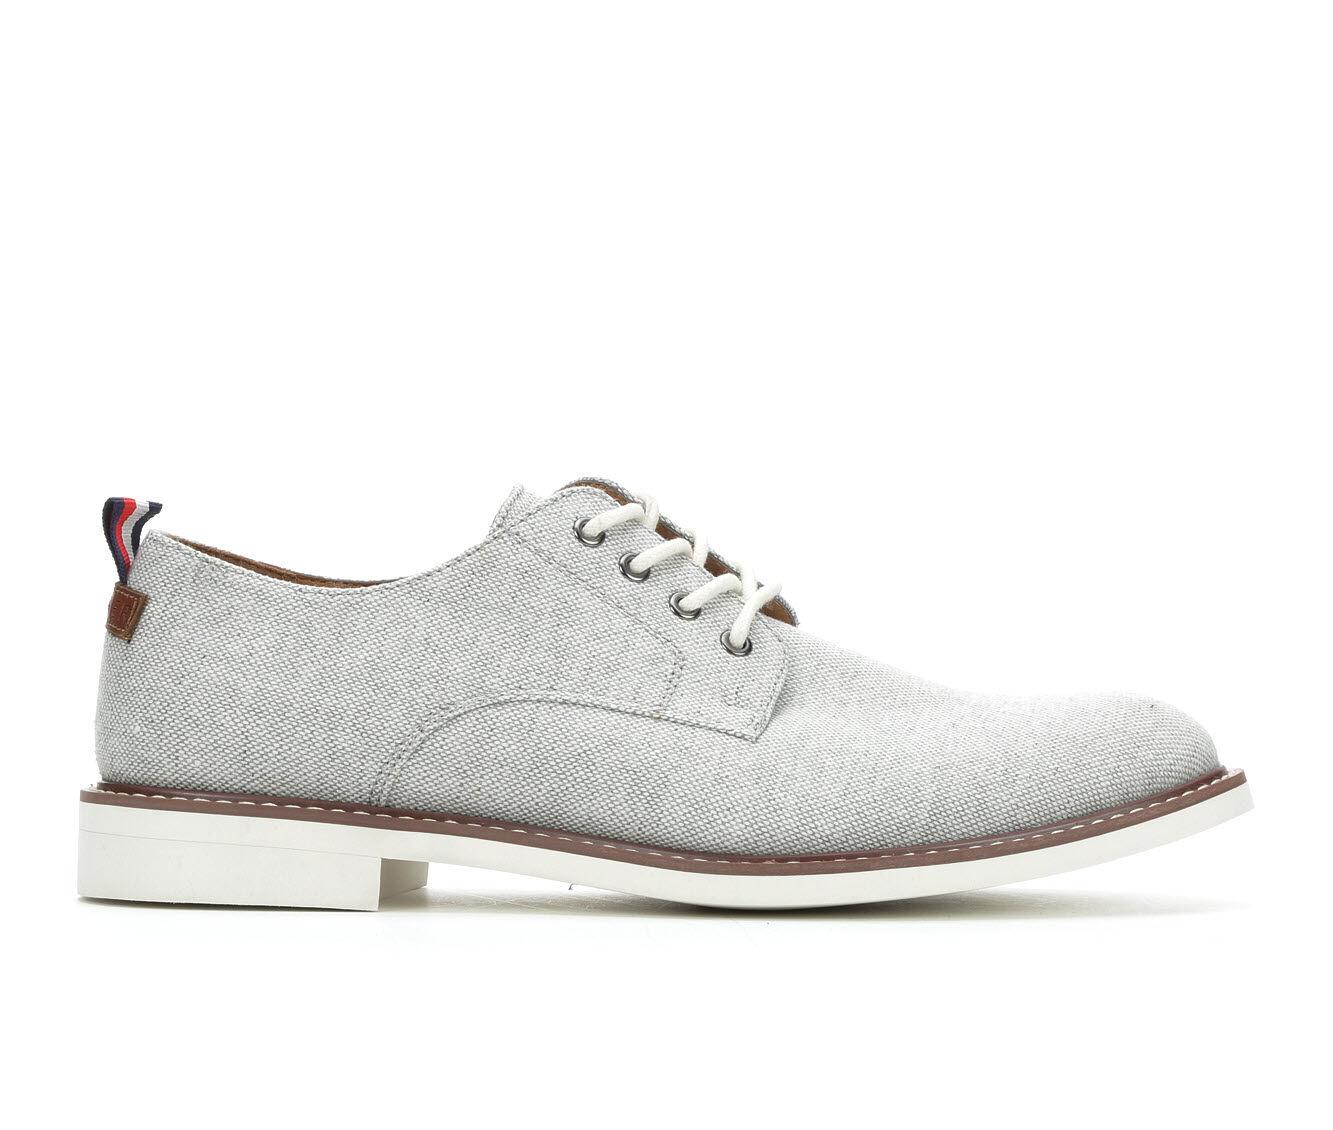 Men's Tommy Hilfiger Garson 4 Dress Shoes Grey Chambray